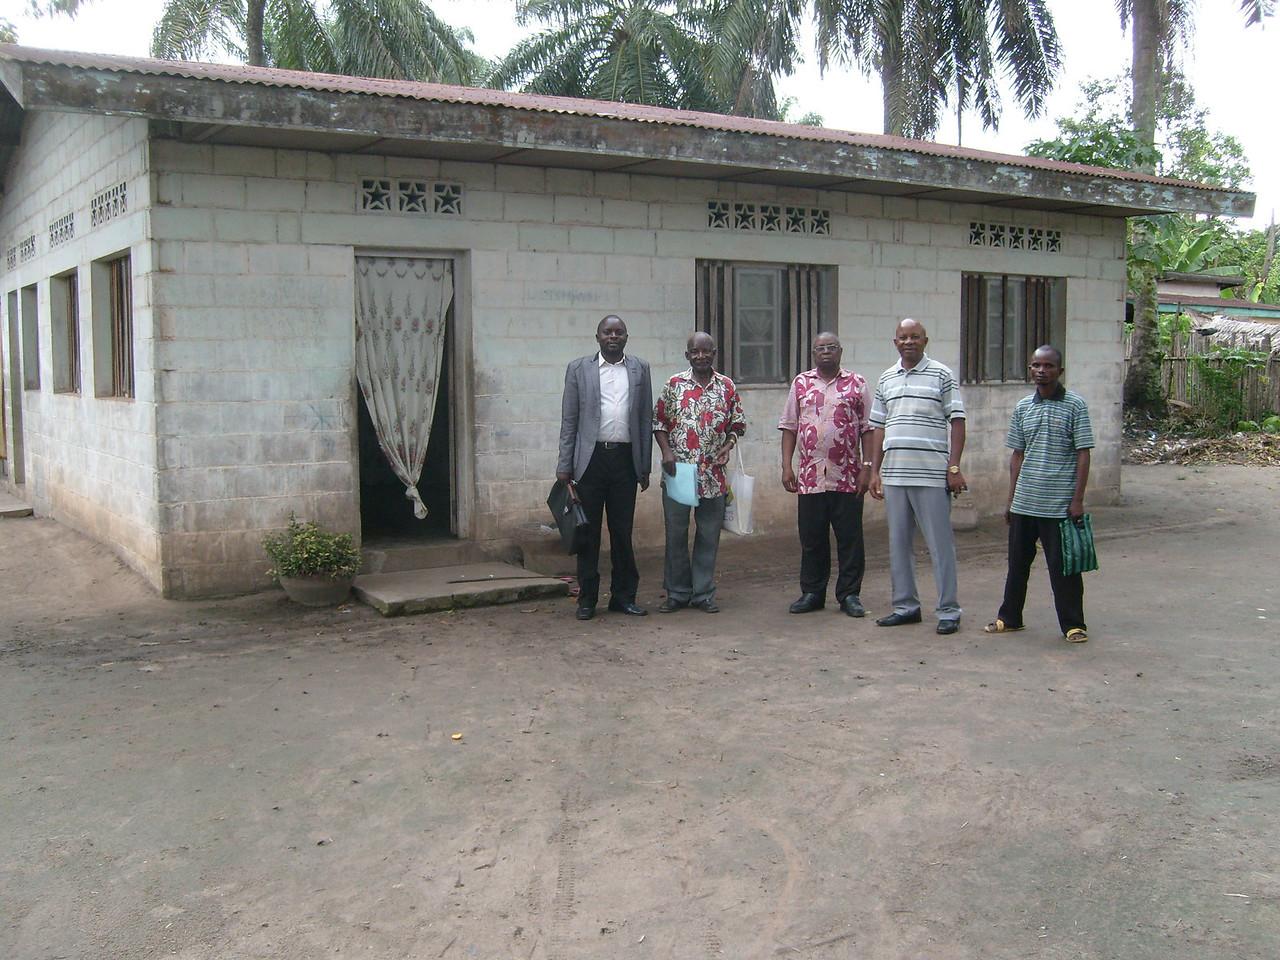 First Bokotola house built in the effort led by Millard and Linda Fuller.